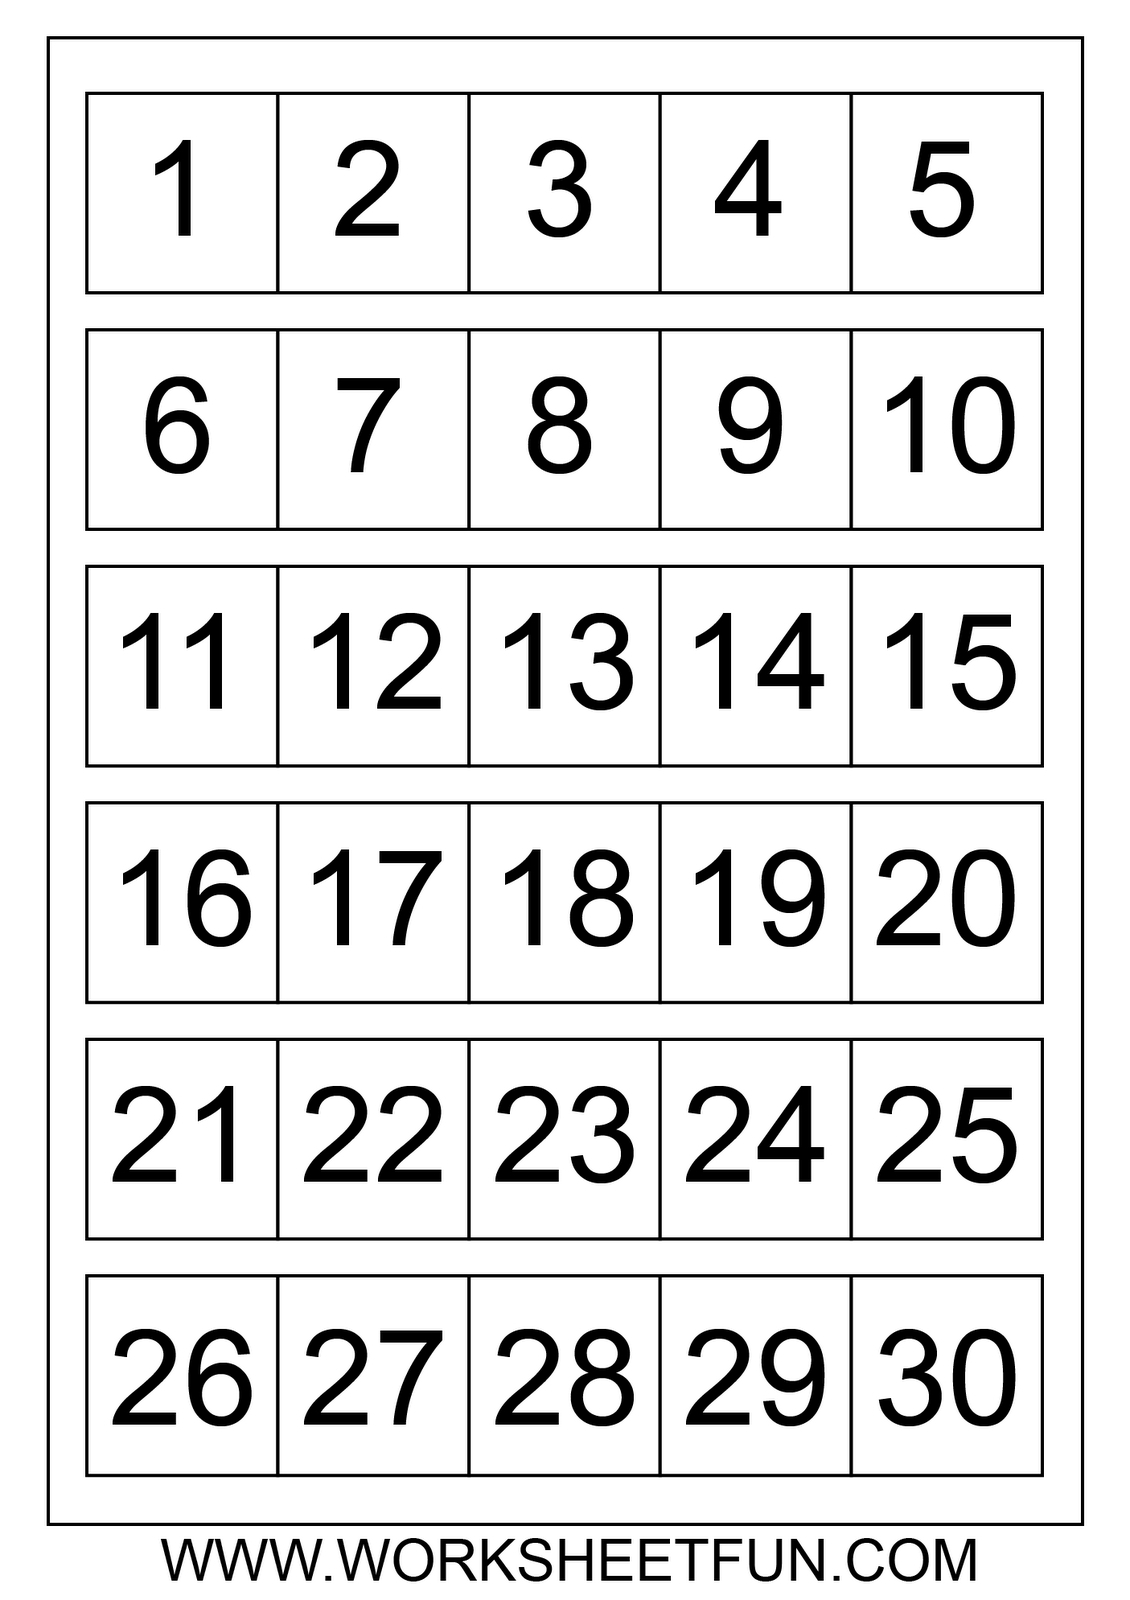 June 2018 – Page 5 – Template Calendar Design Calendar Numbers 1 31 Printable